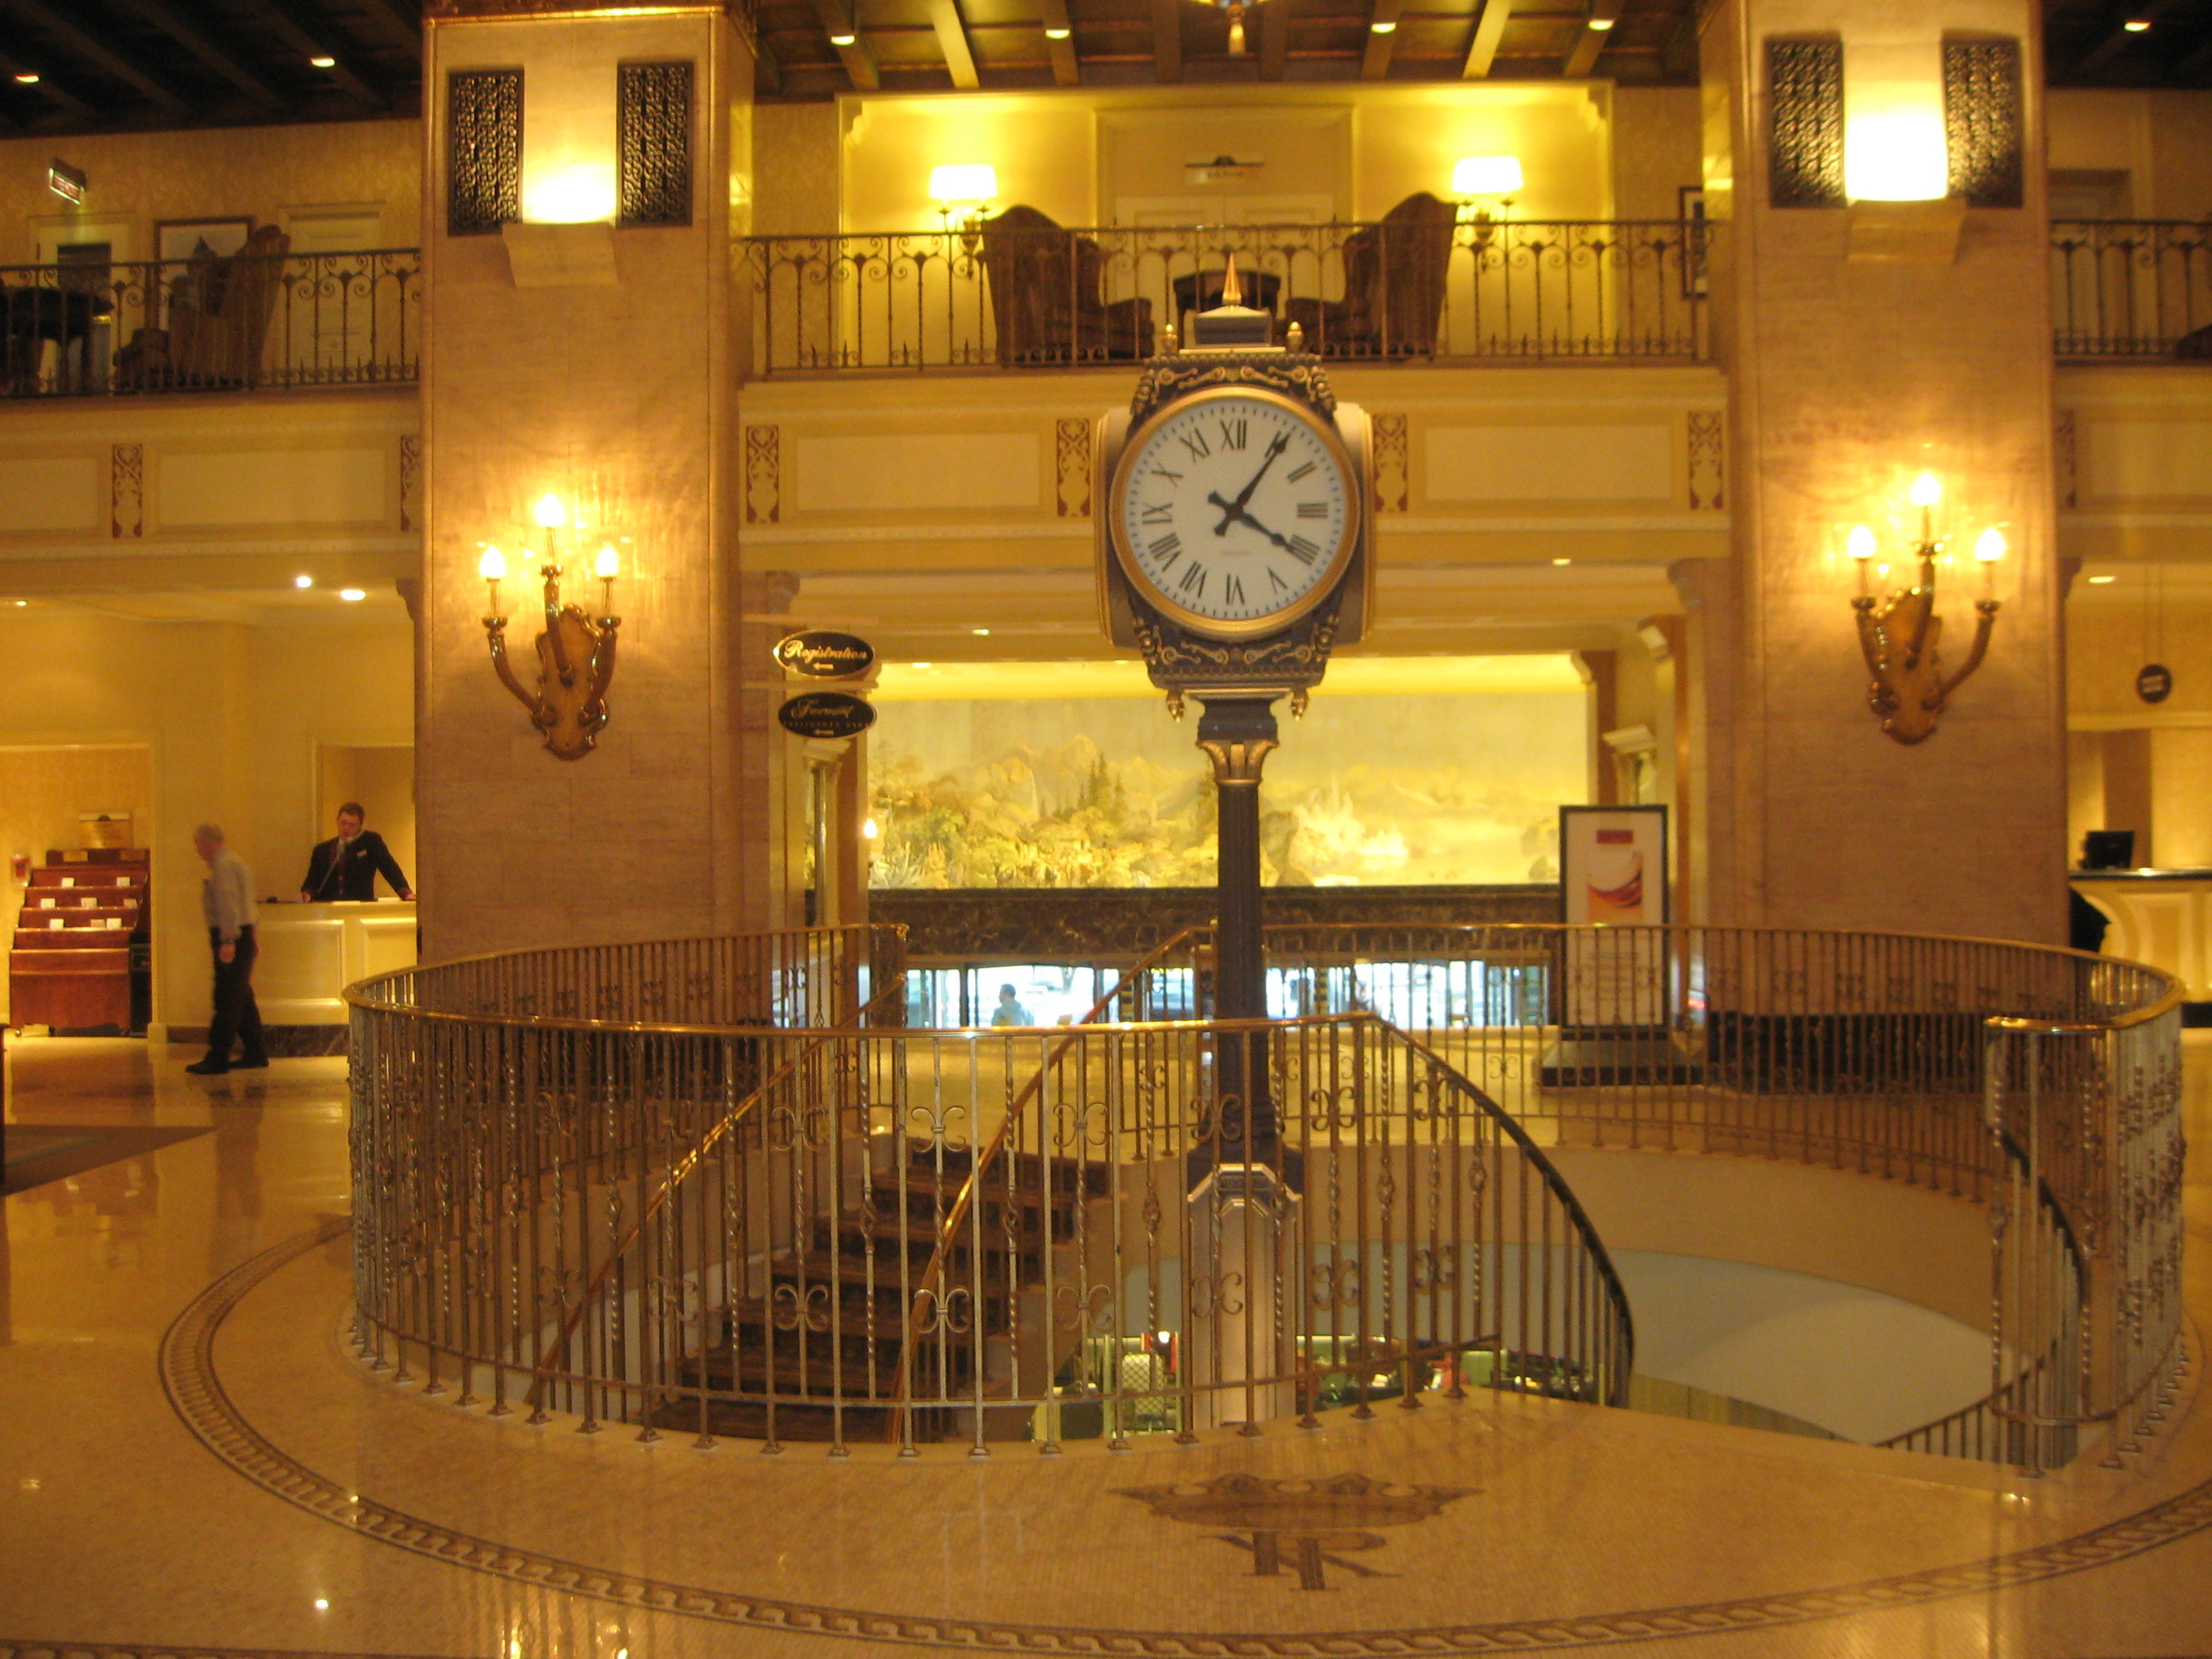 The Royal York Hotel Lobby